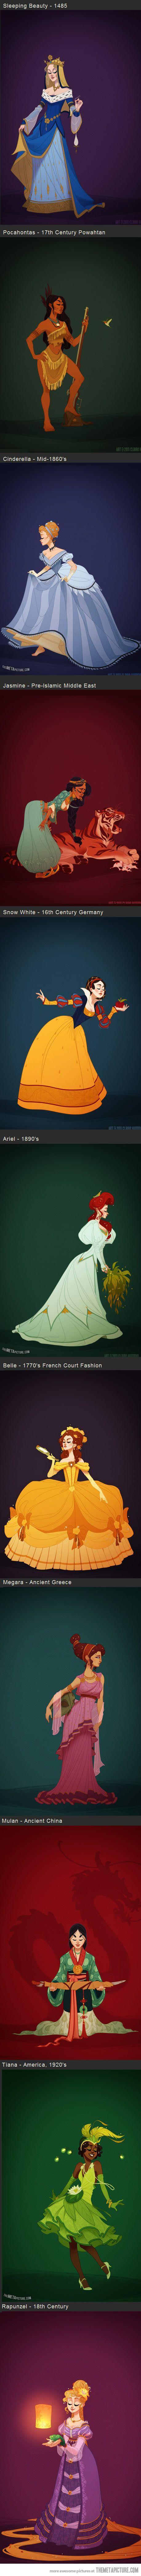 Disney Princesses in accurate period costume. Tiana <3 So perfect *_*